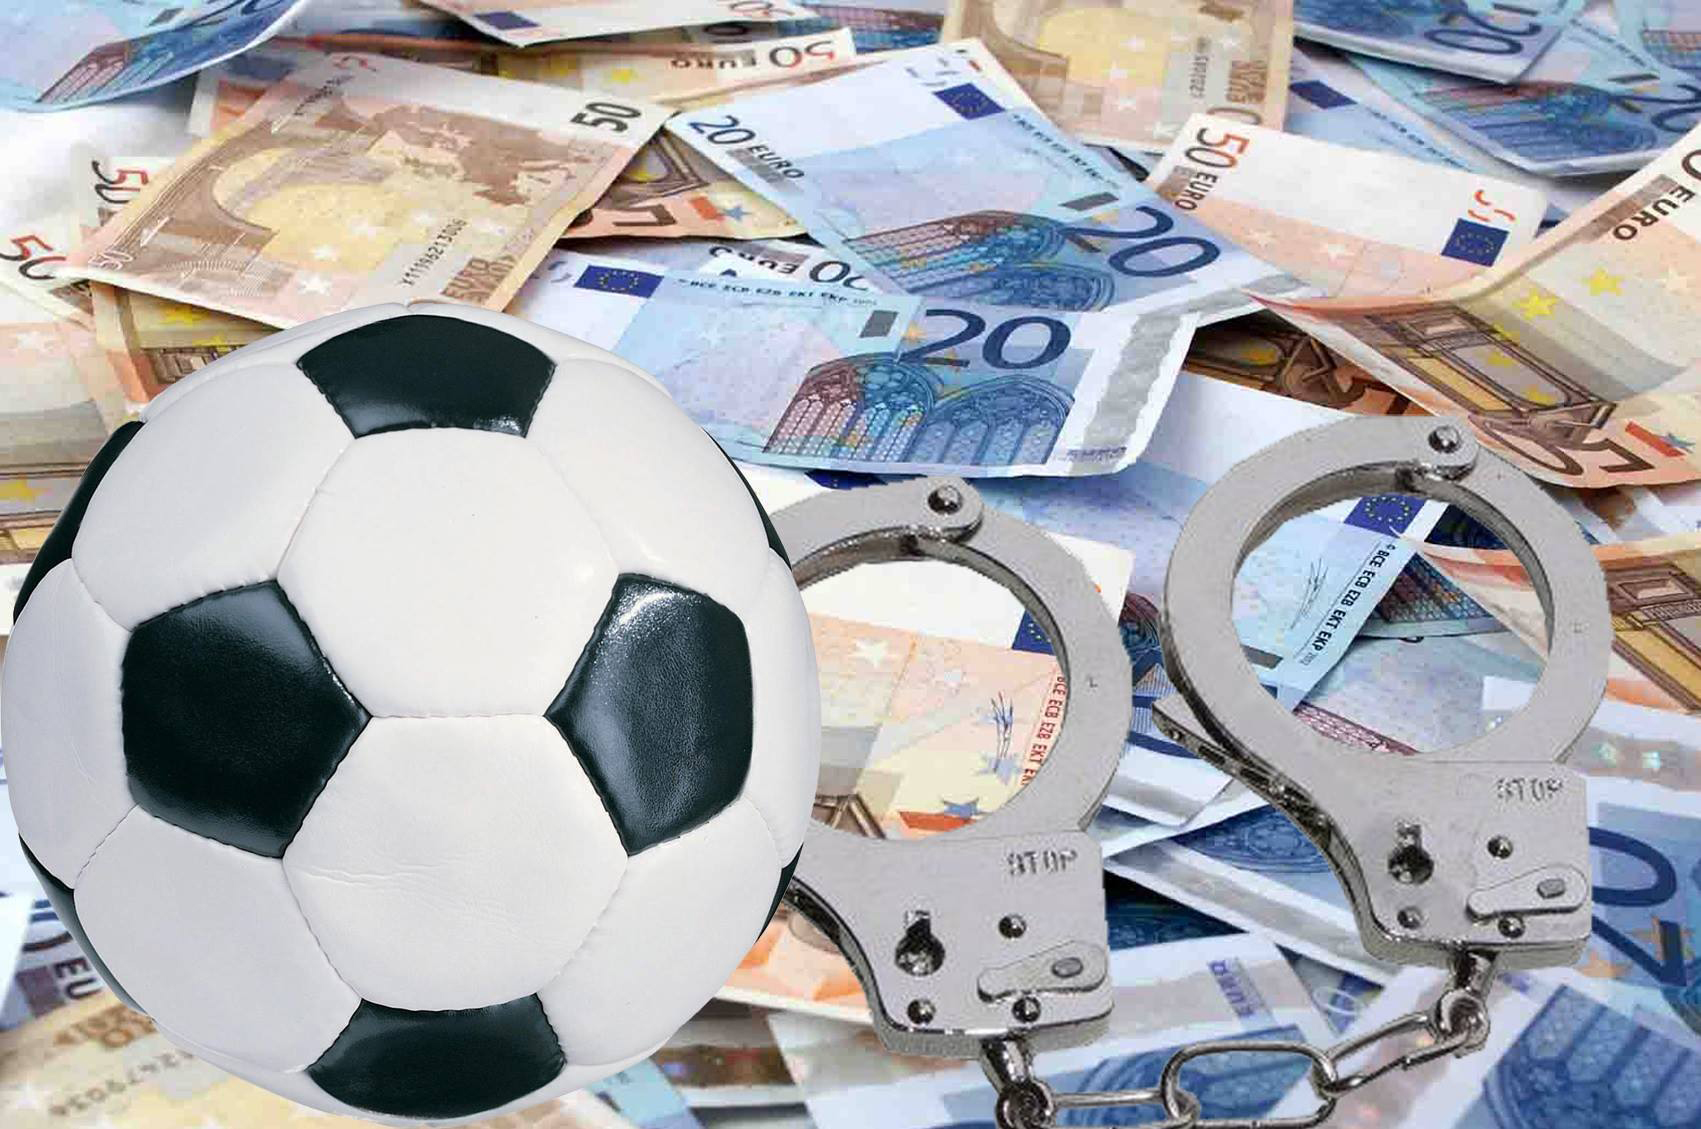 Calcioscommesse: nuovo fango sul Novara calcio?